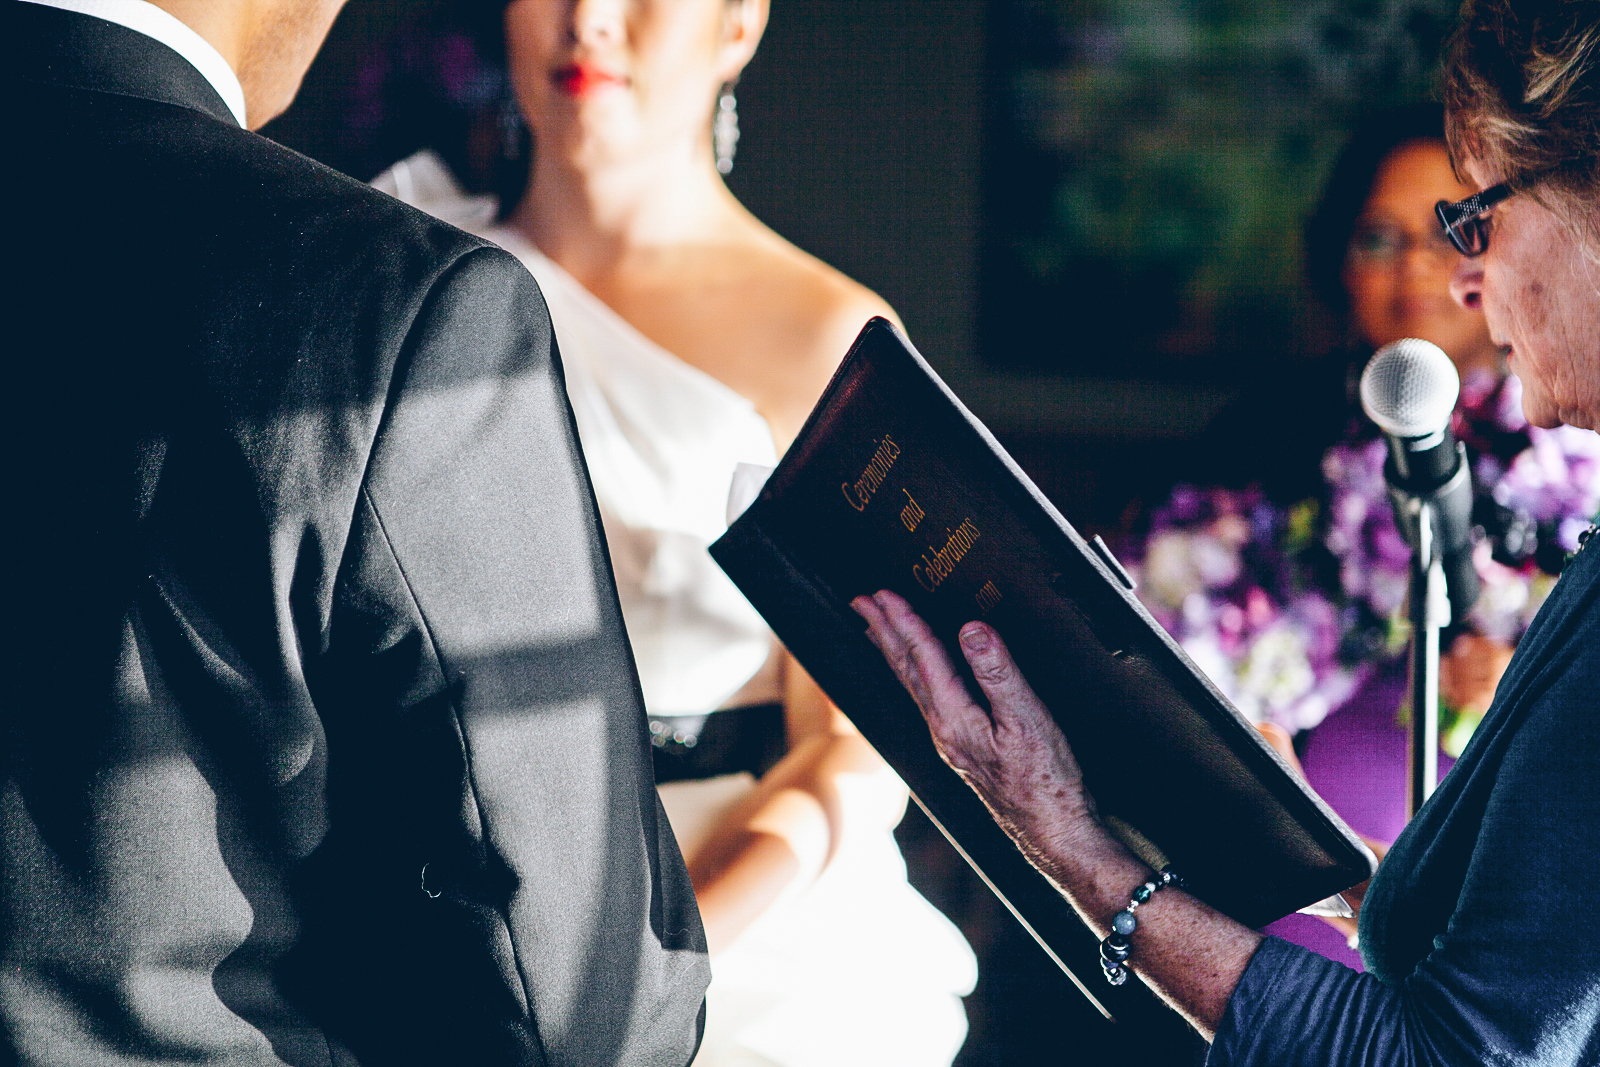 greens_restaurant_wedding_photography_san_franscisco_ebony_siovhan_bokeh_photography_42.jpg